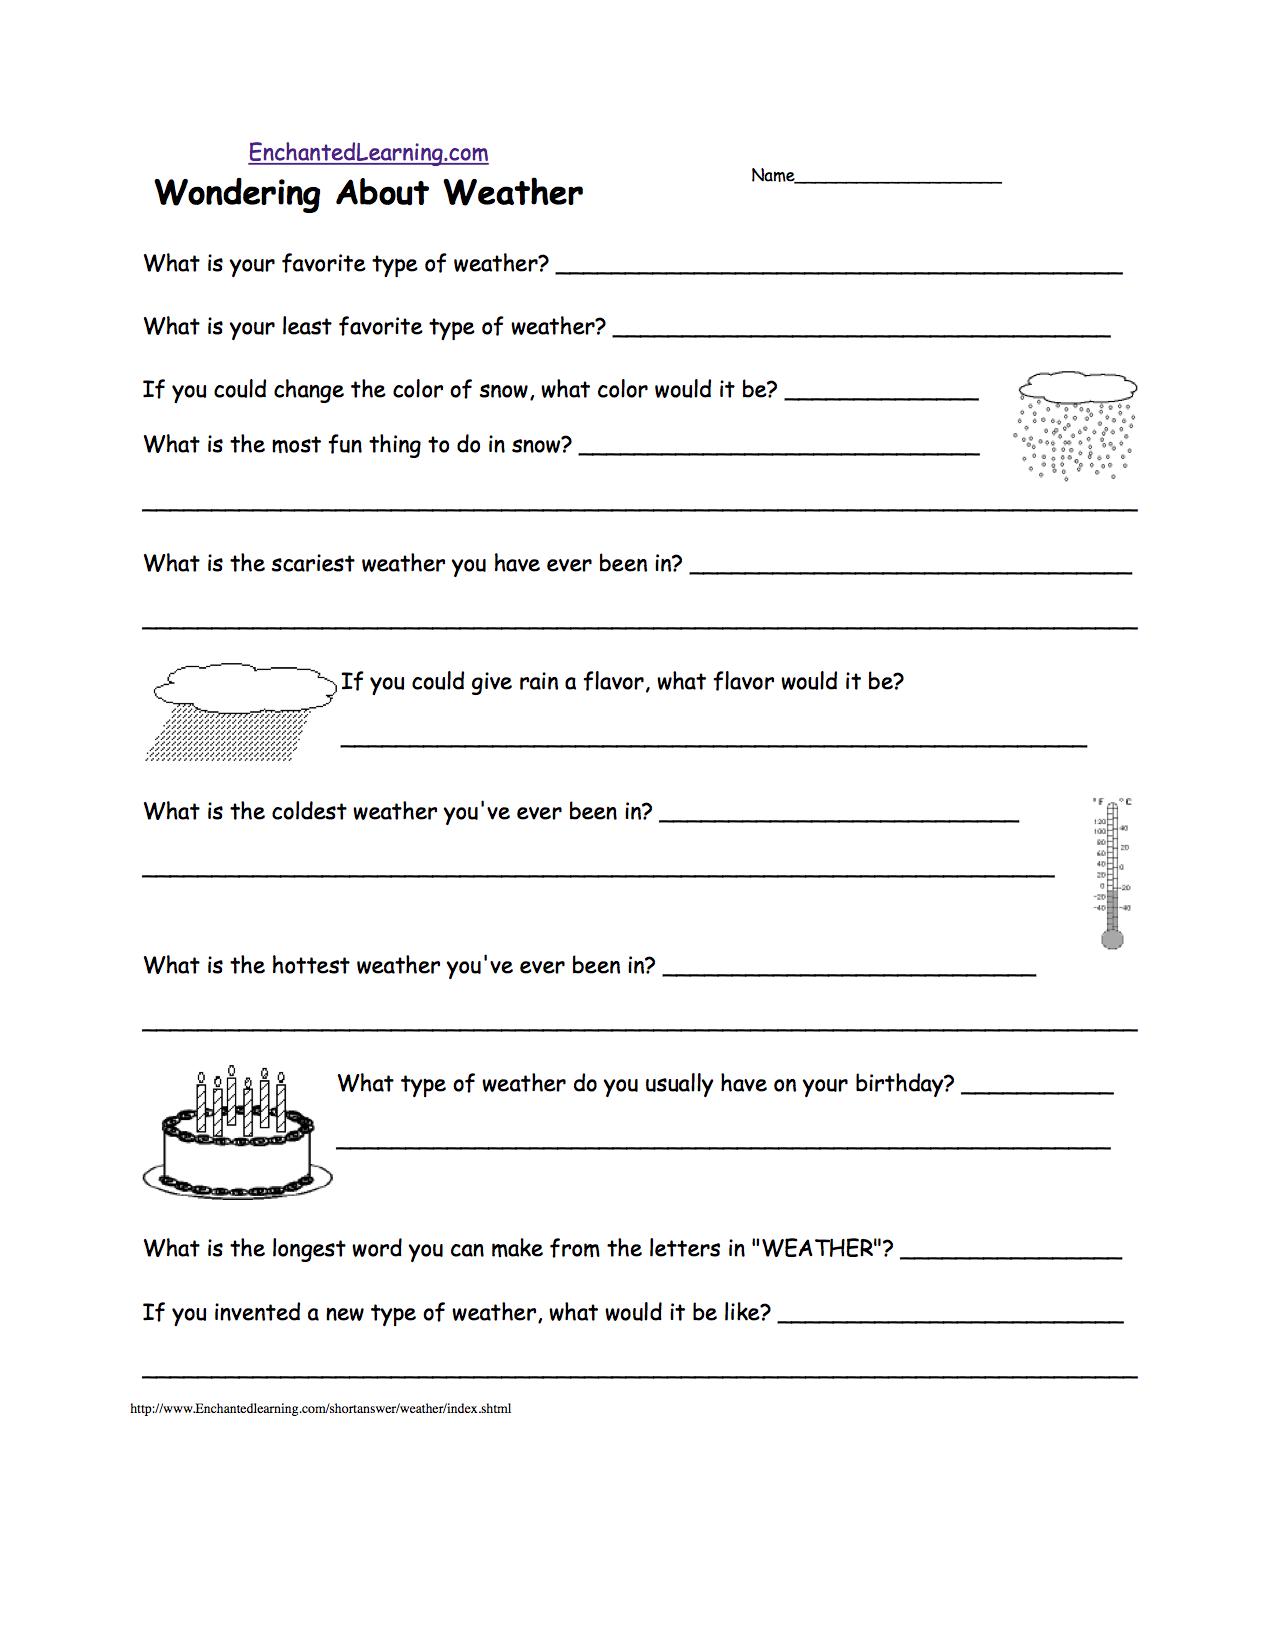 Weather Worksheet Middle School The Best Worksheets Image